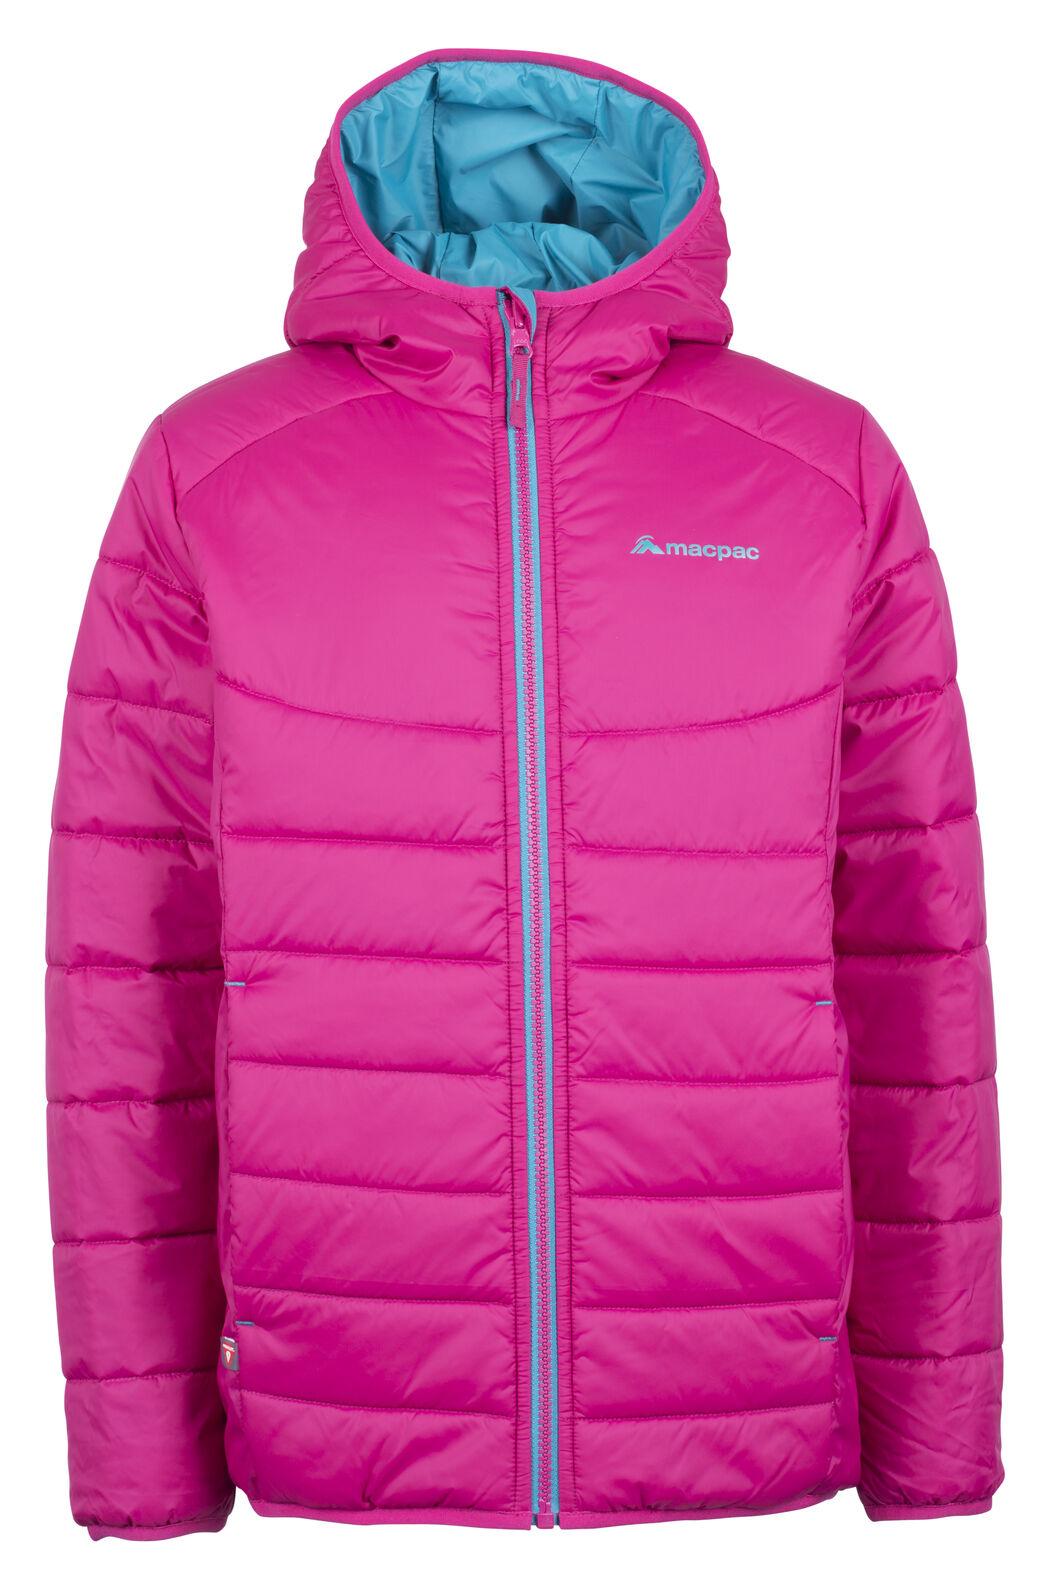 Macpac Pulsar Hooded Primaloft® SILVER Jacket - Kids', Sangria, hi-res